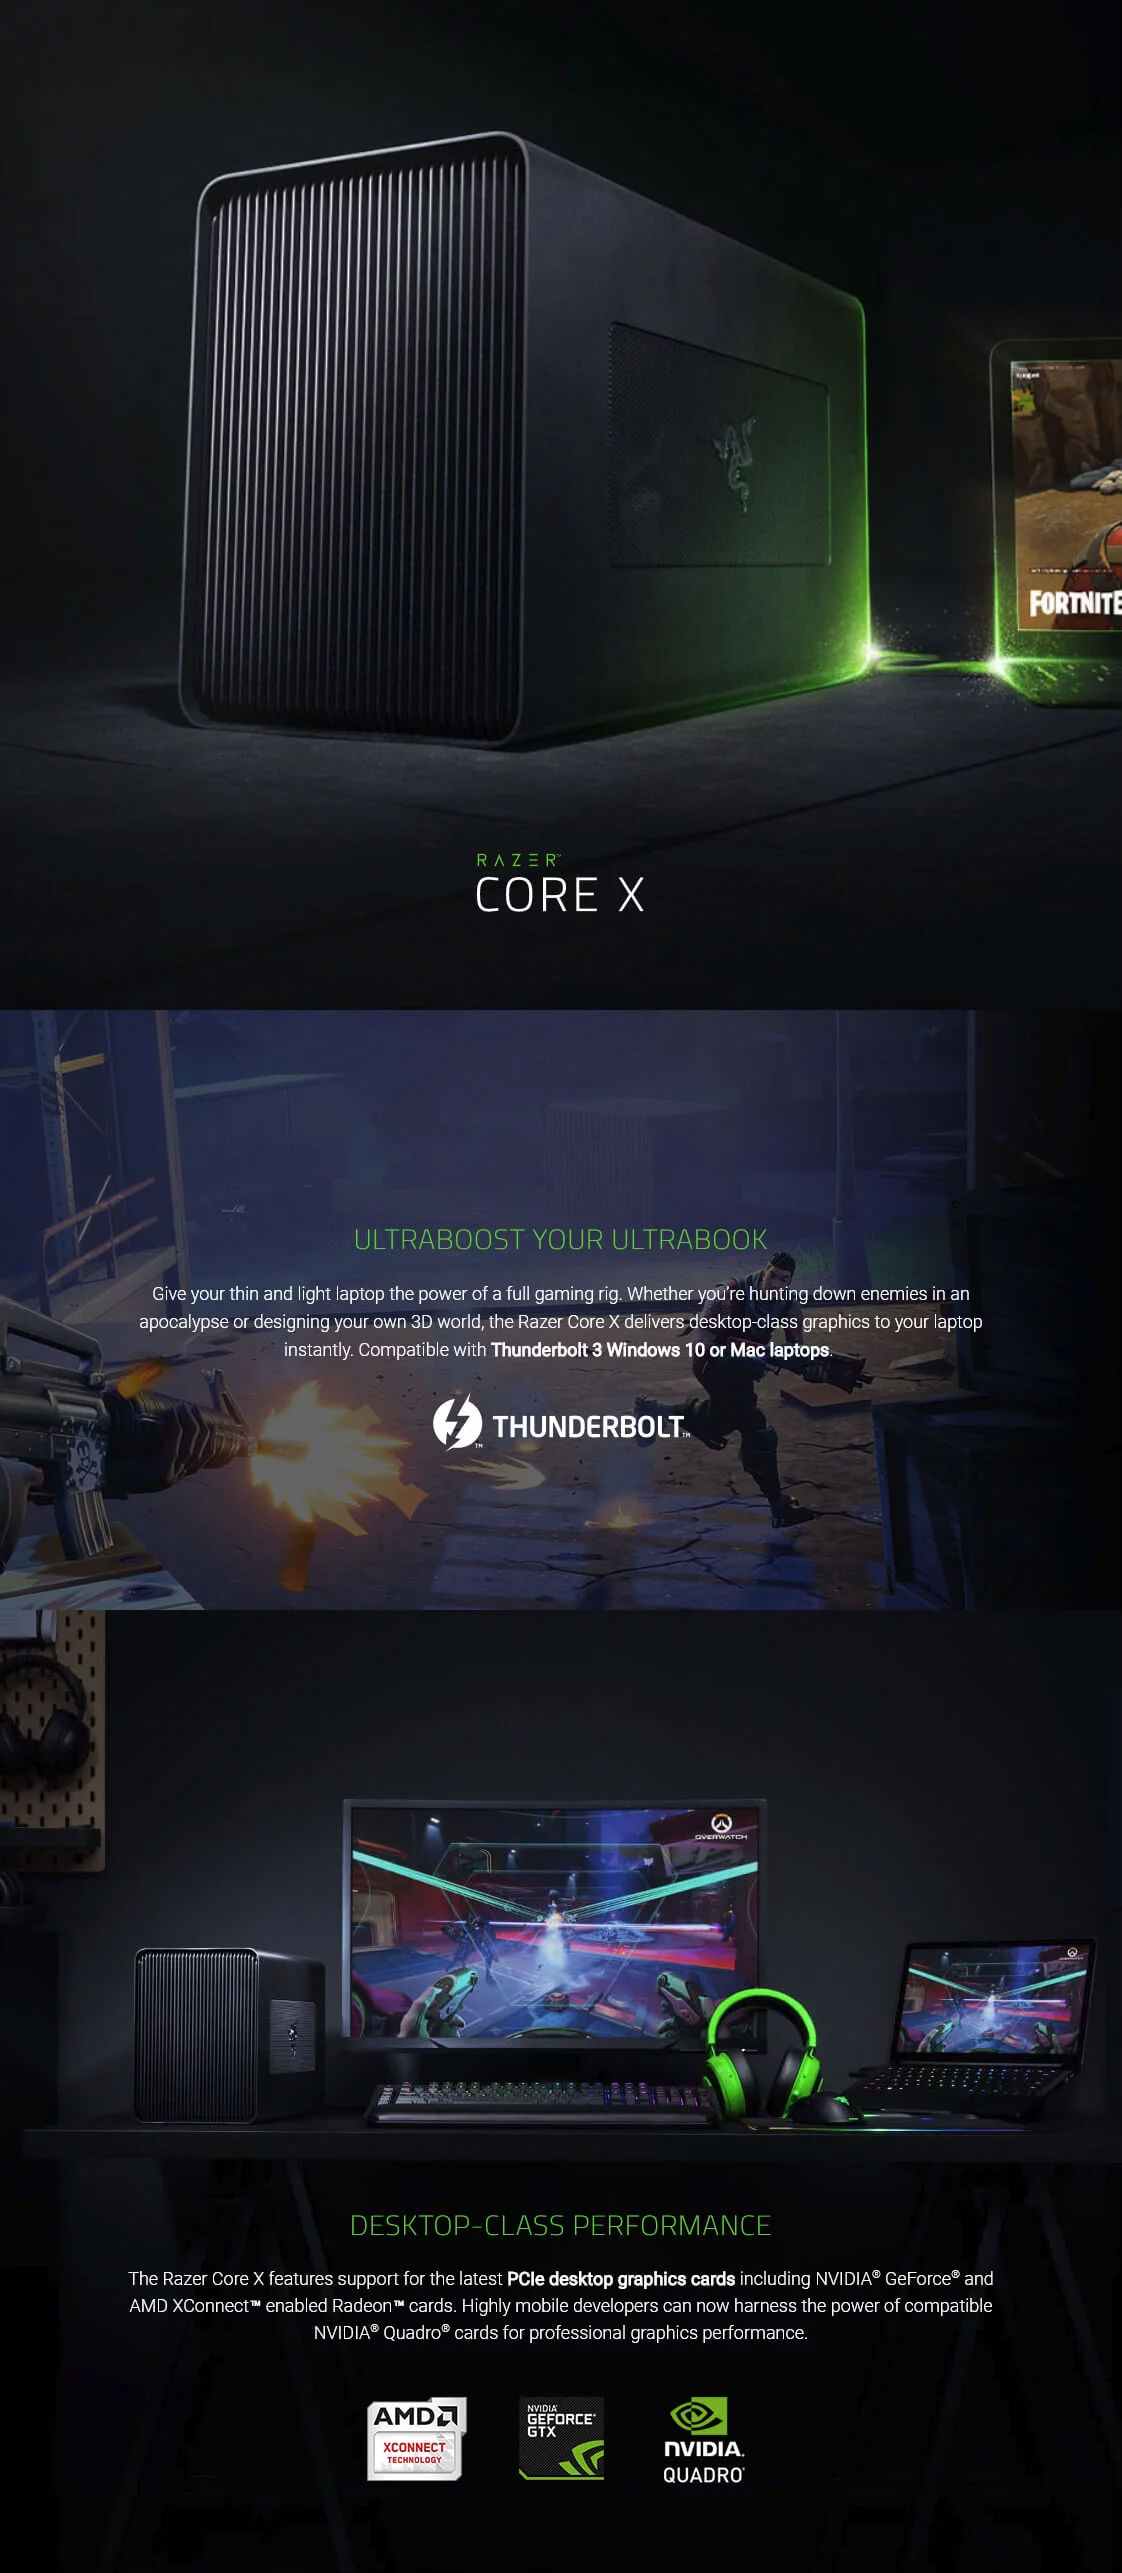 Razer Core X Thunderbolt 3 External Graphics Card Enclosure